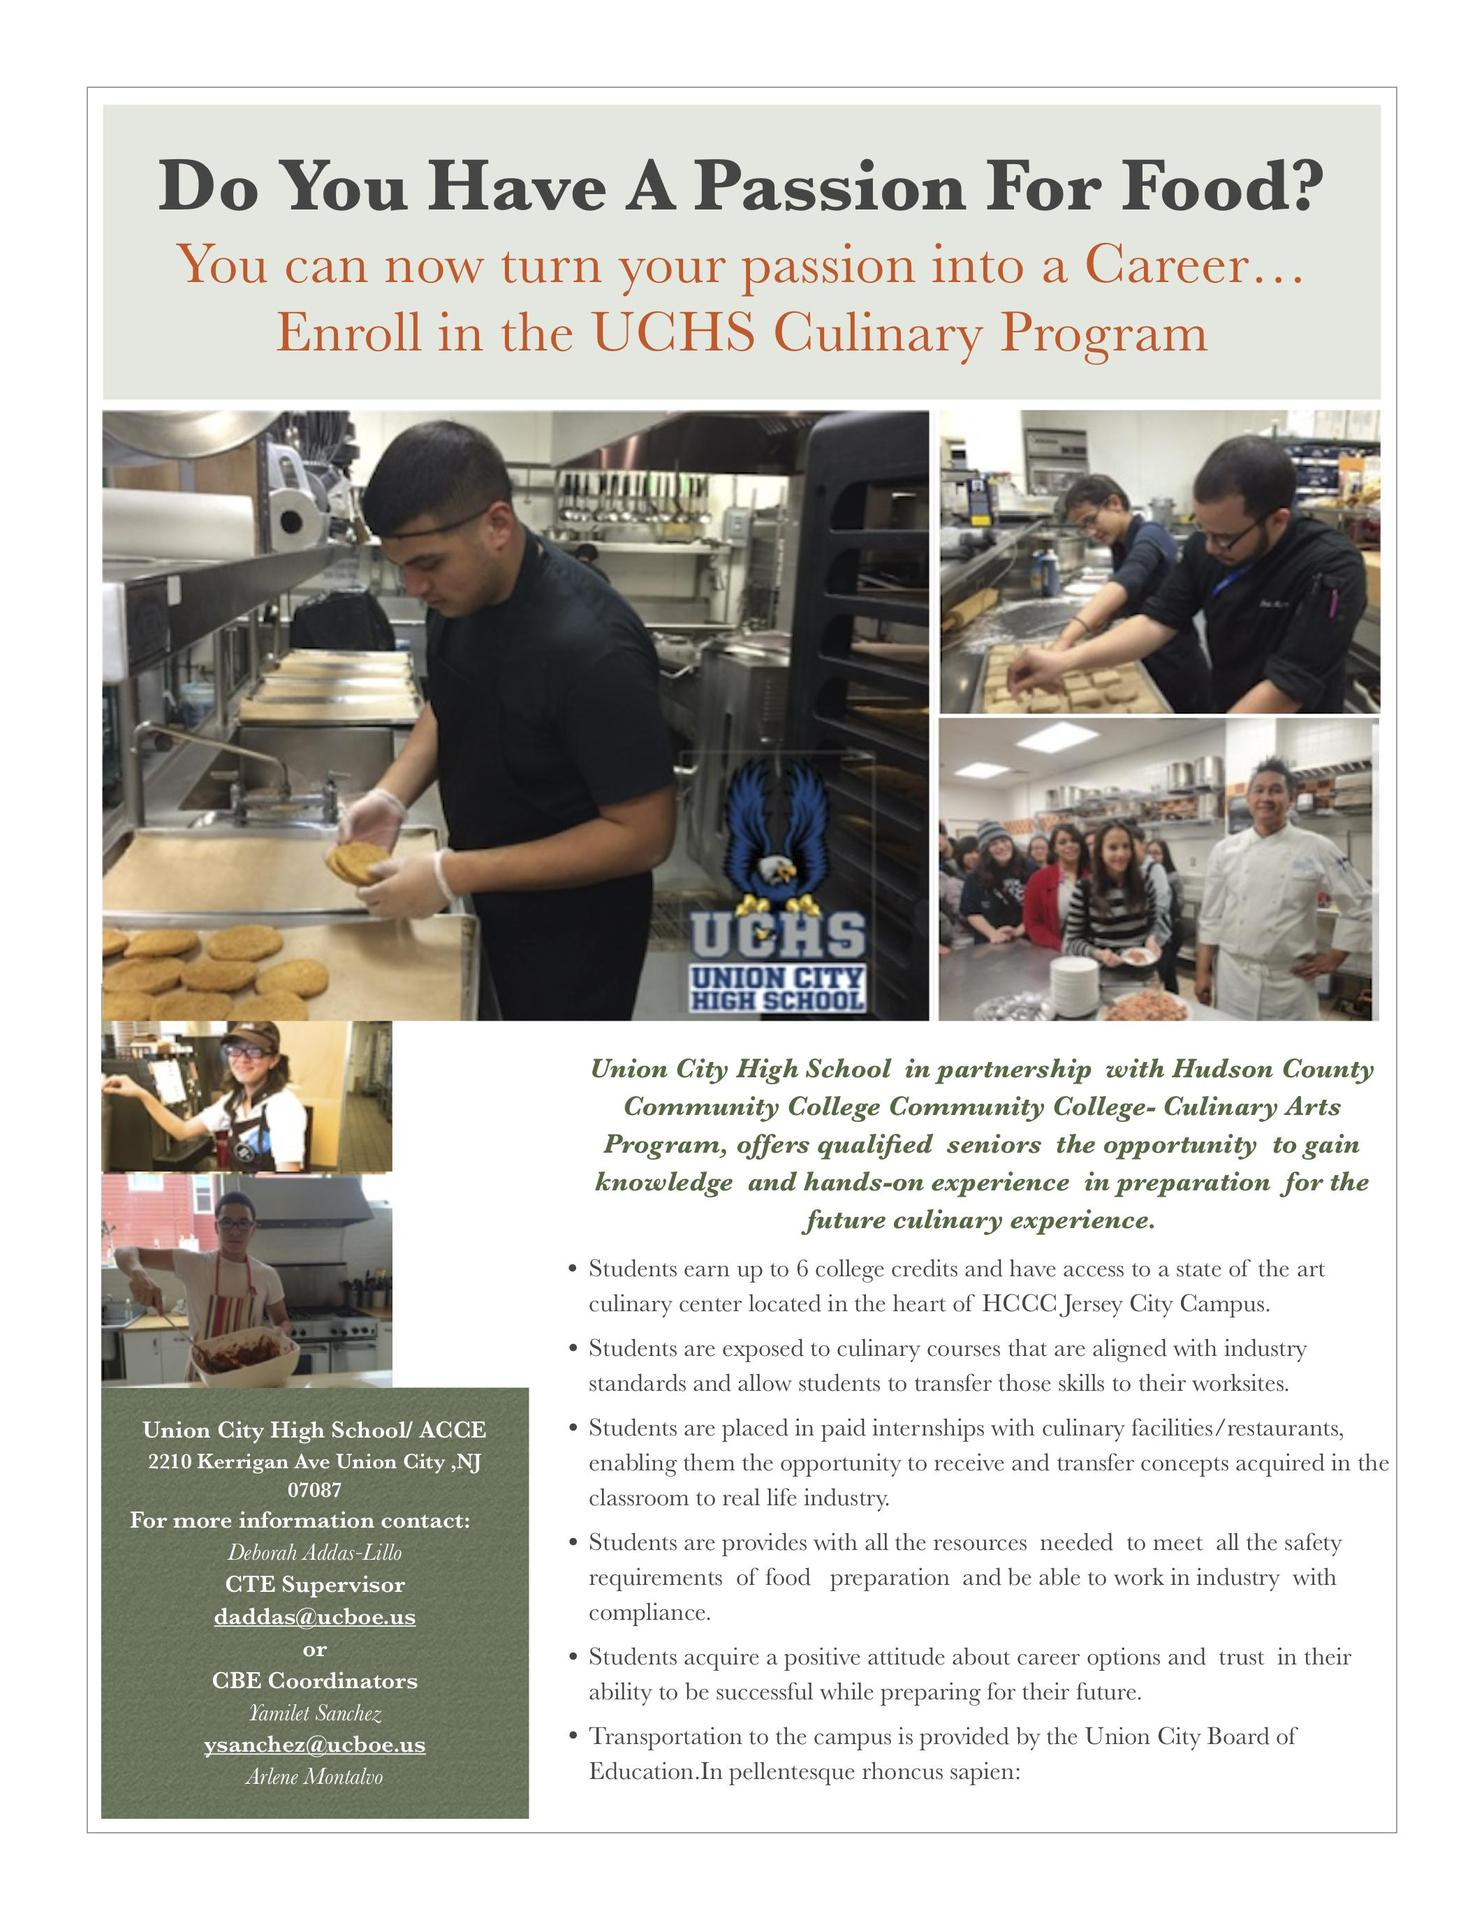 Culinary program partnership flyer